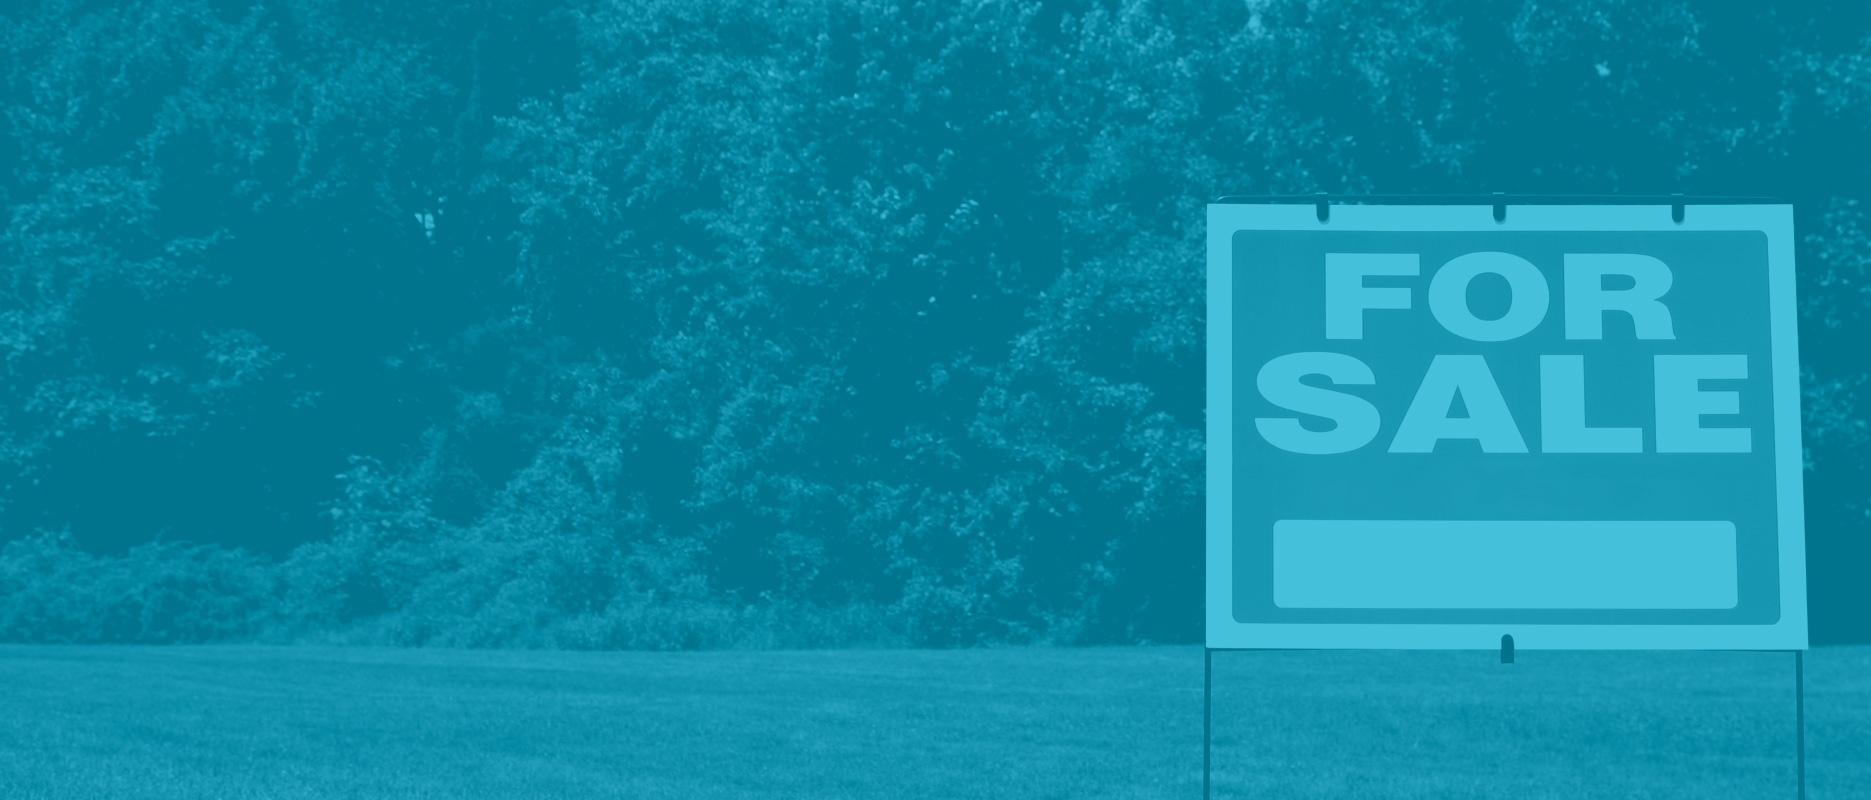 Get a Land Loan with Louisiana FCU.